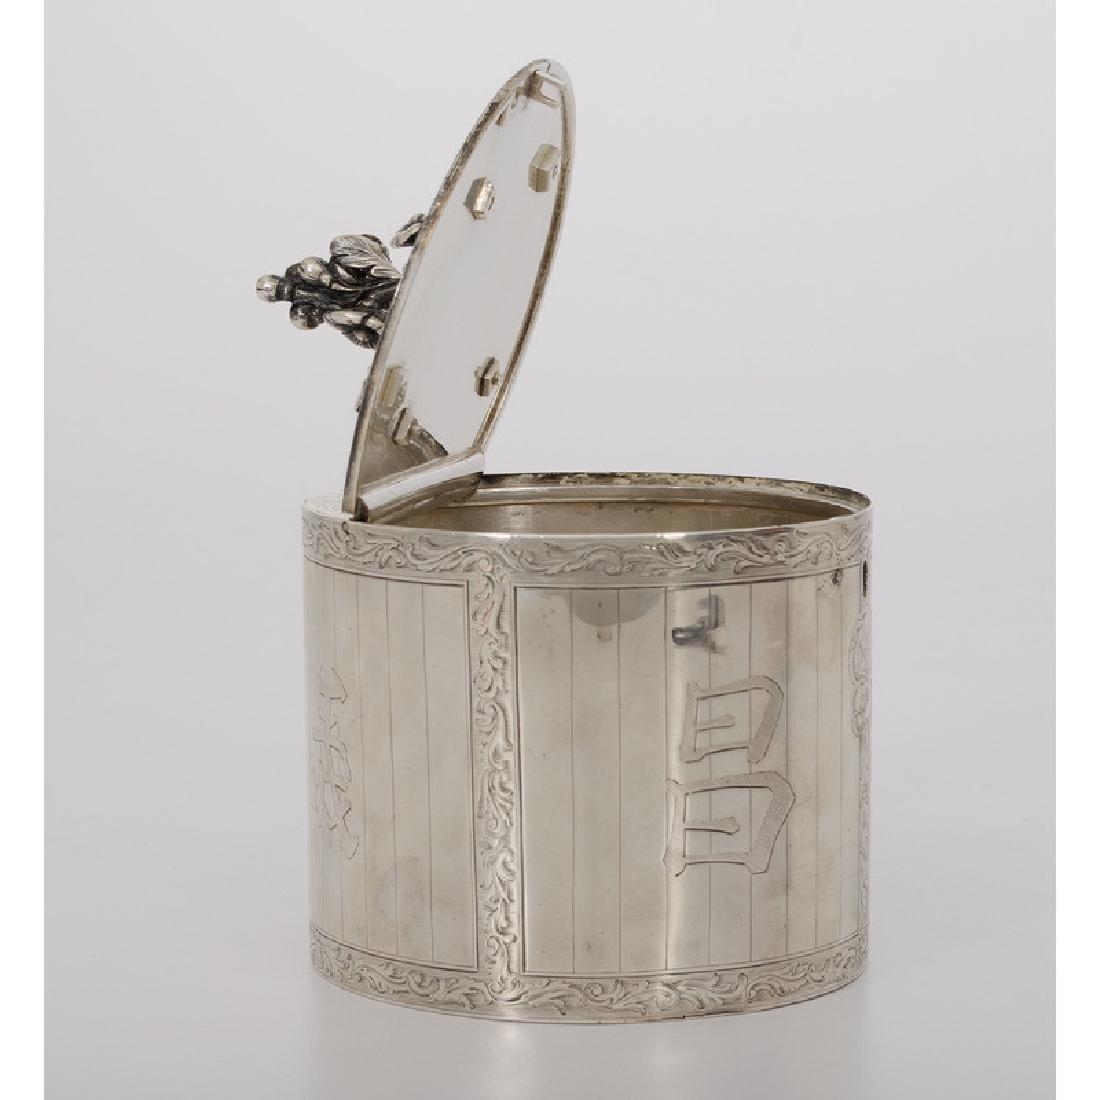 Chinoiserie Silver Tea Caddy, Parker & Wakelin - 3